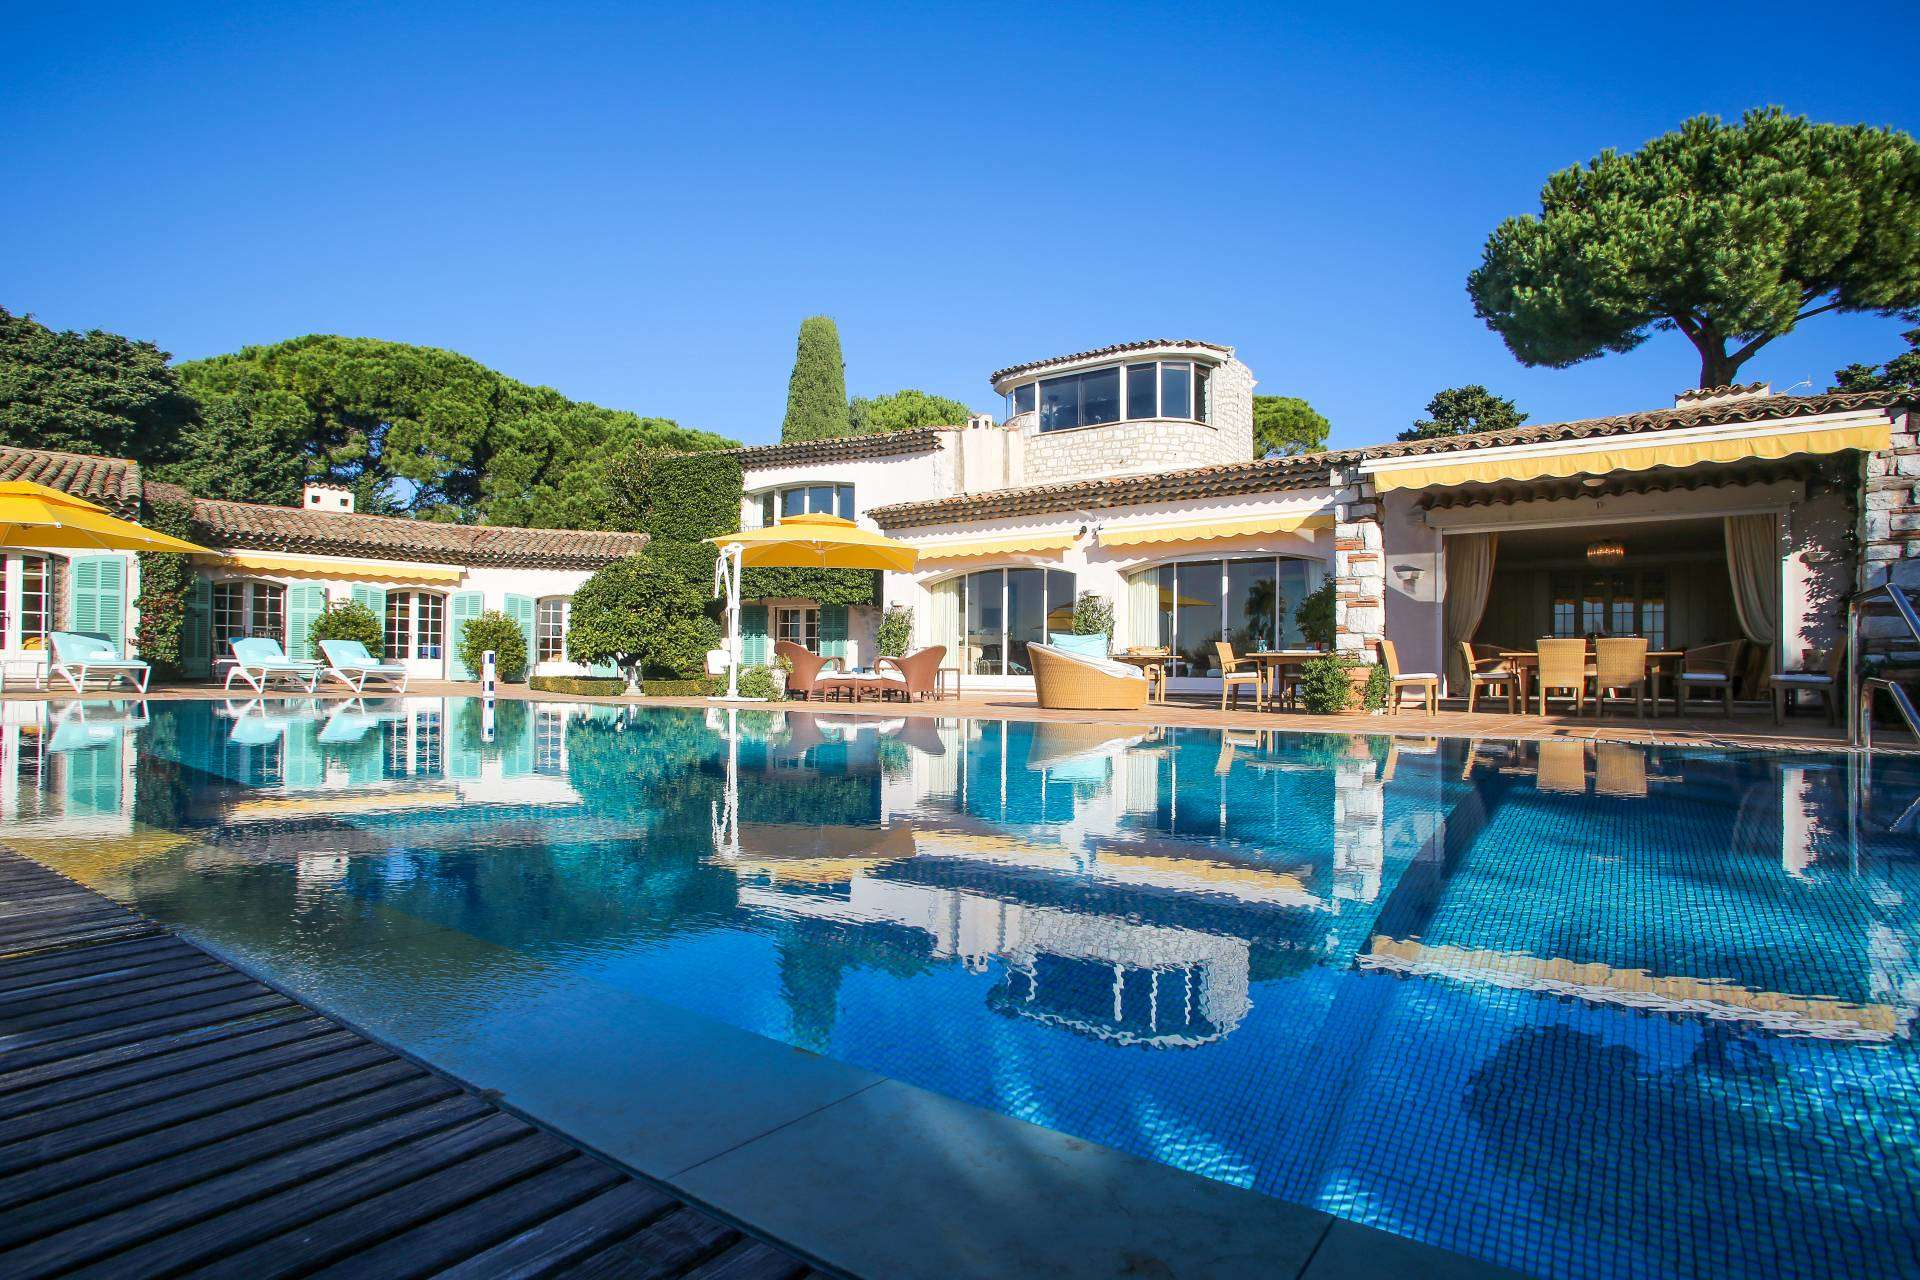 Luxury vacation rentals europe - France - Frenchriviera - Antibes - Villa Artemis - Image 1/24